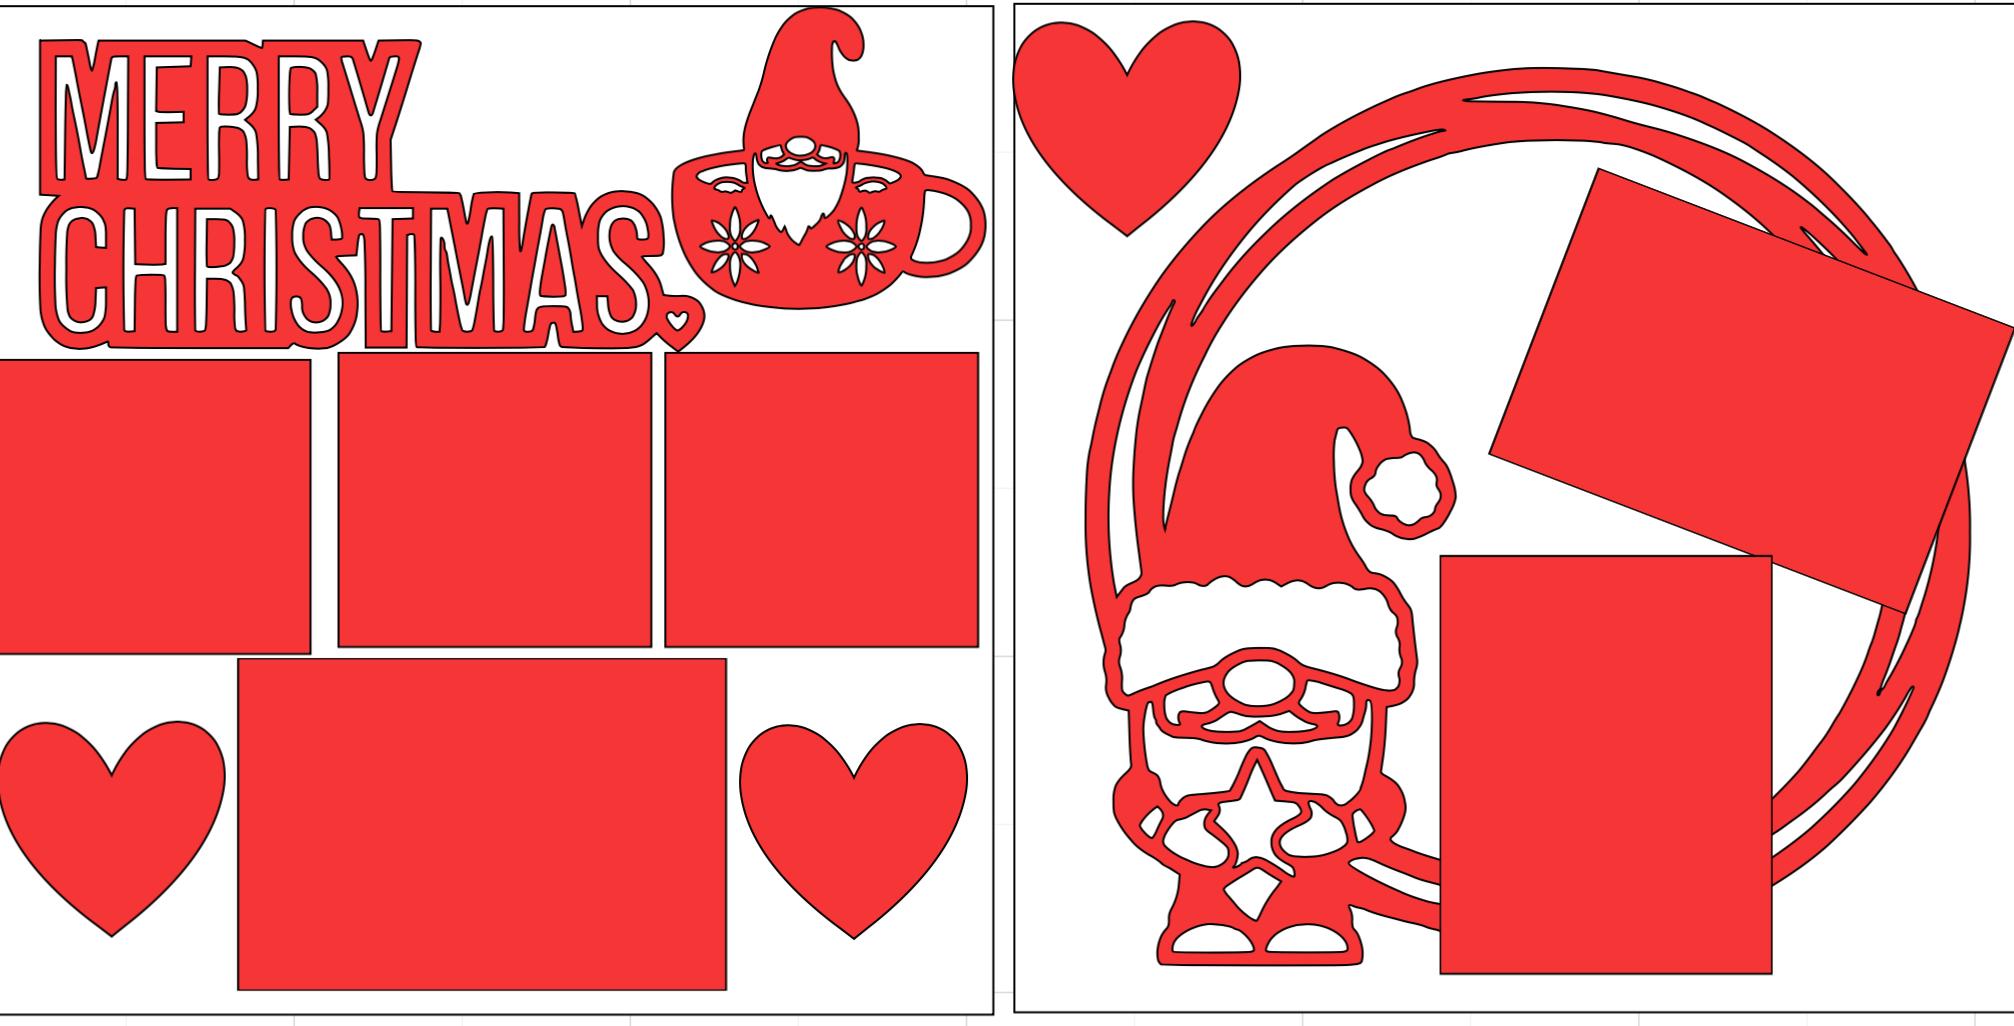 Merry Christmas gnome)-  page kit